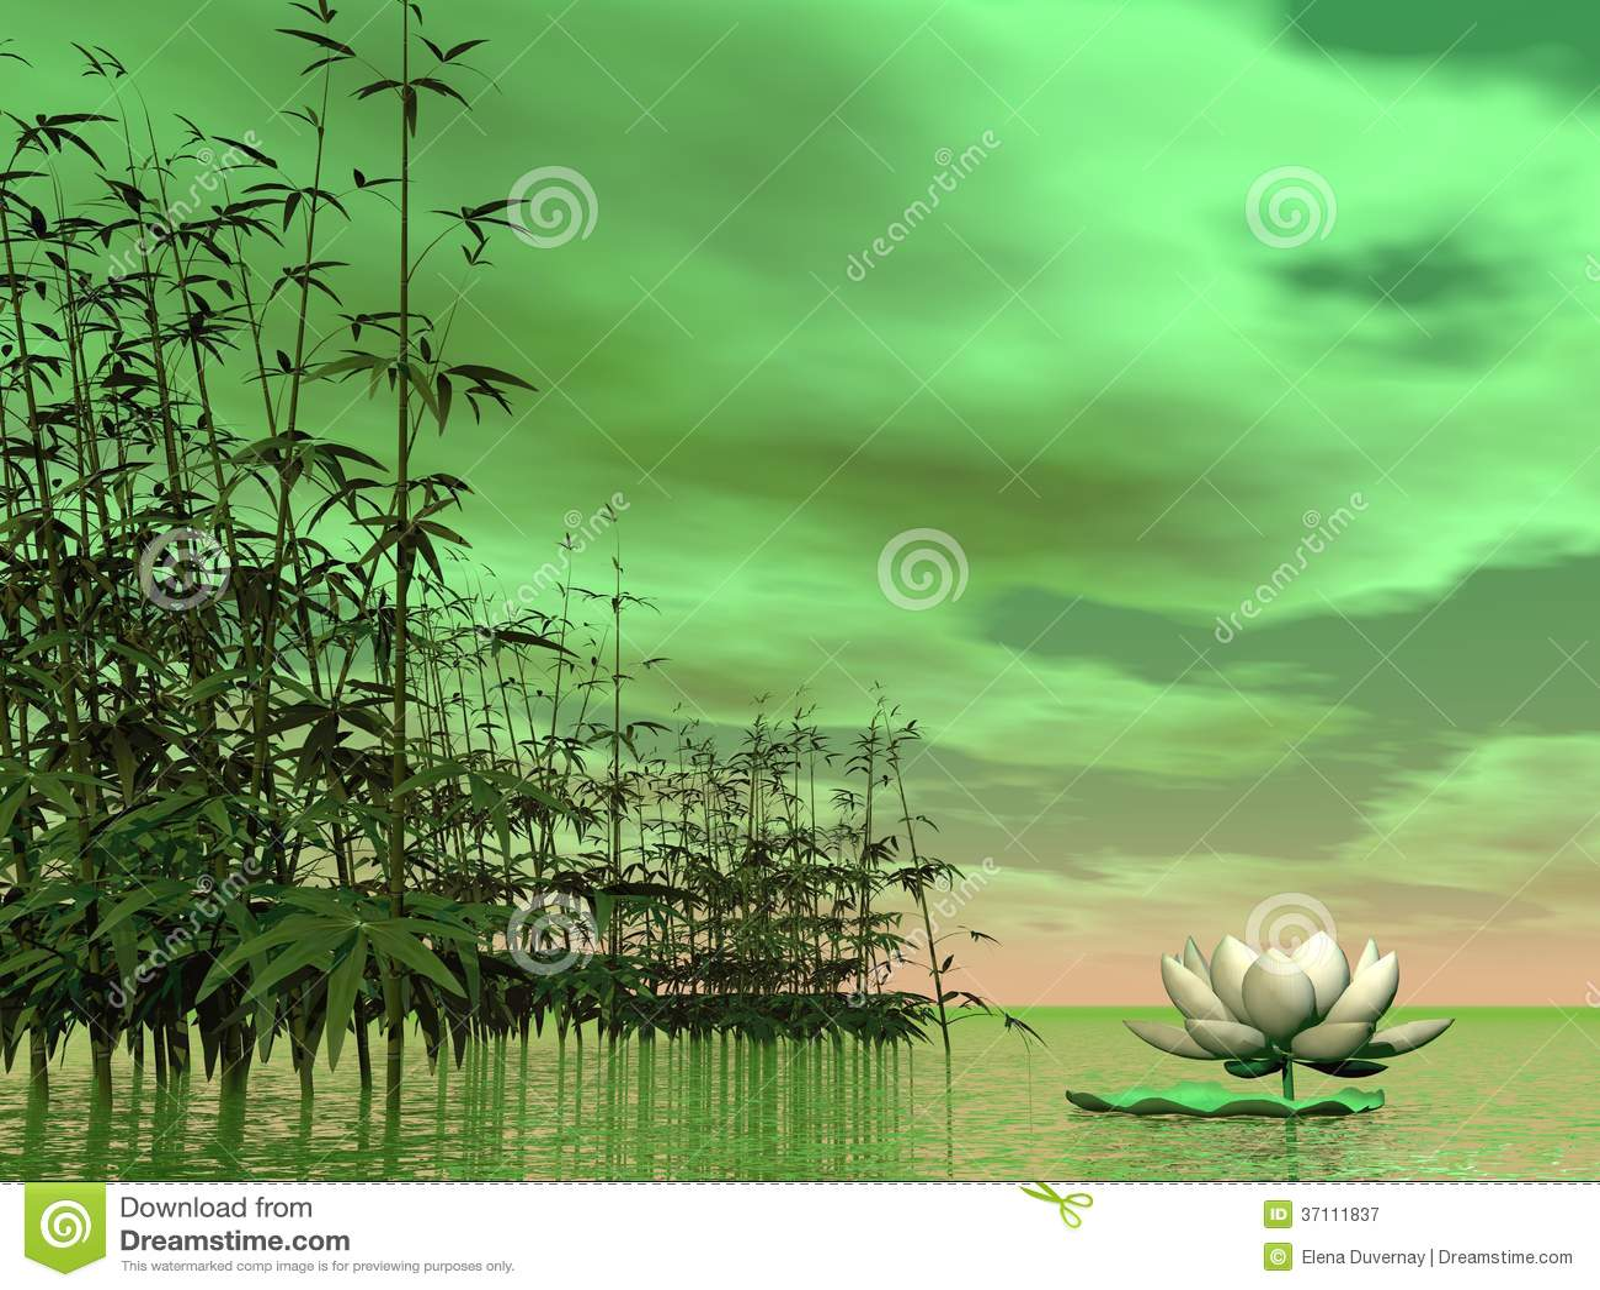 Zen nature 3d render stock illustration image of graphic 37111837 - Image zen nature ...